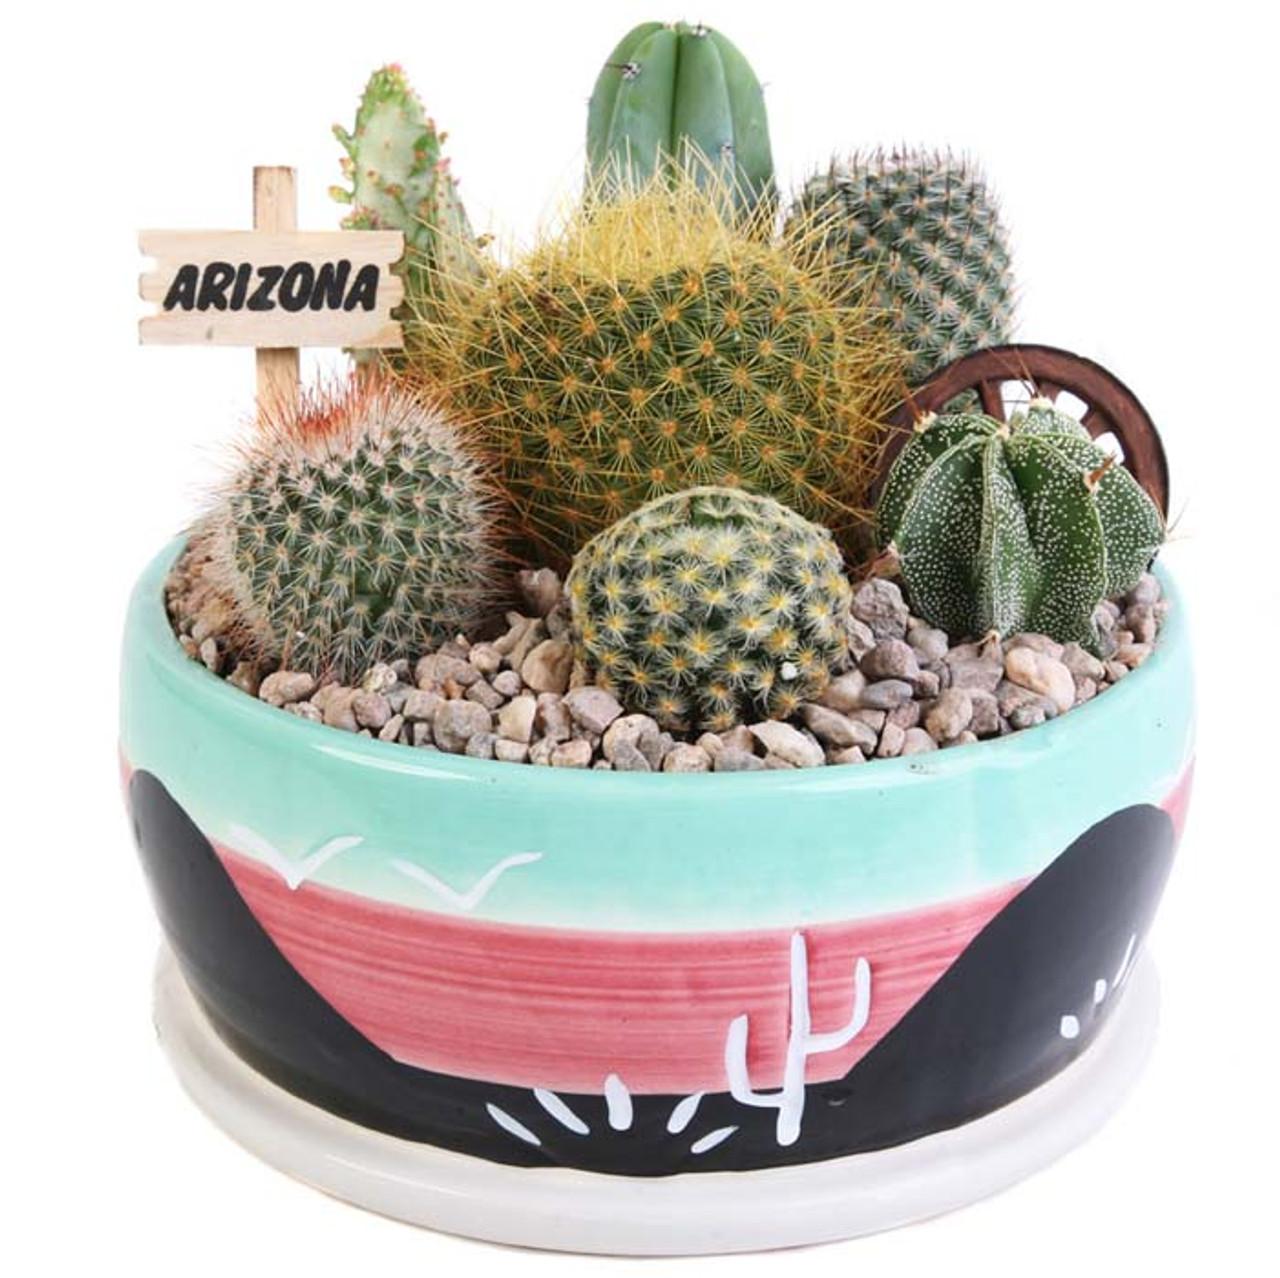 Cactus Garden - 6 inch